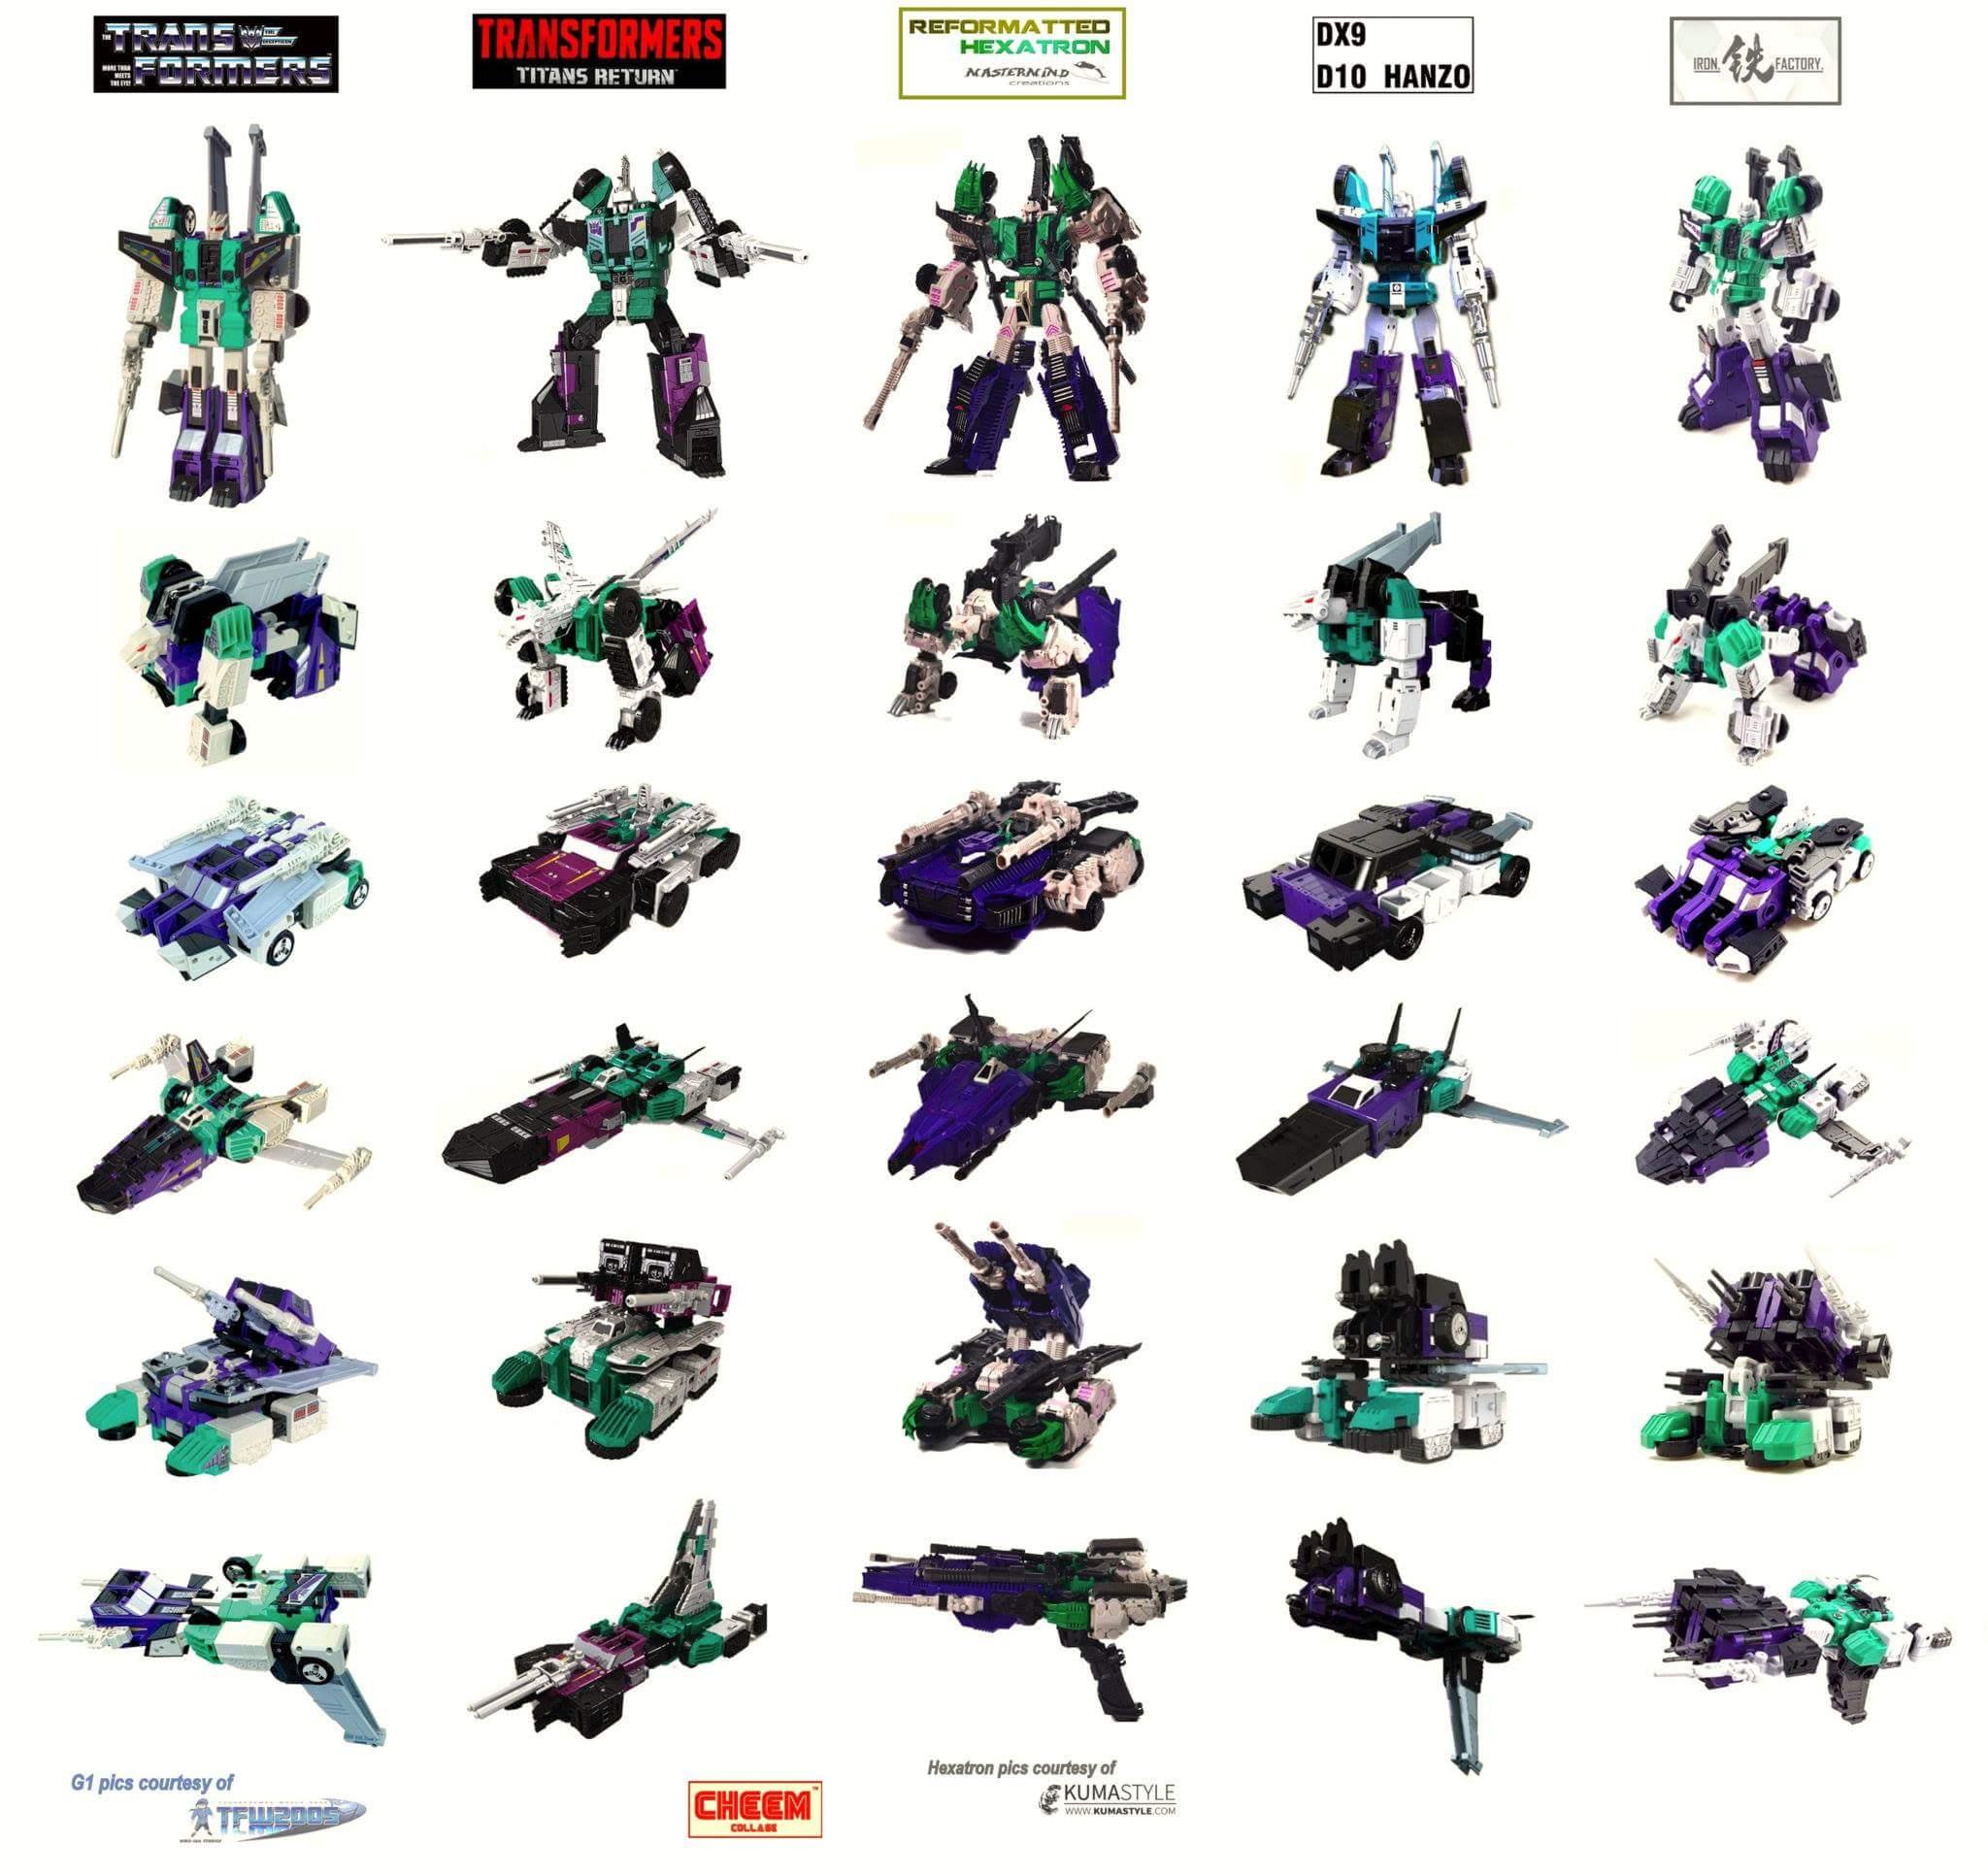 [DX9 Toys] Produit Tiers - Jouet D10 Hanzo - aka Sixshot/Hexabot HurQcqsf